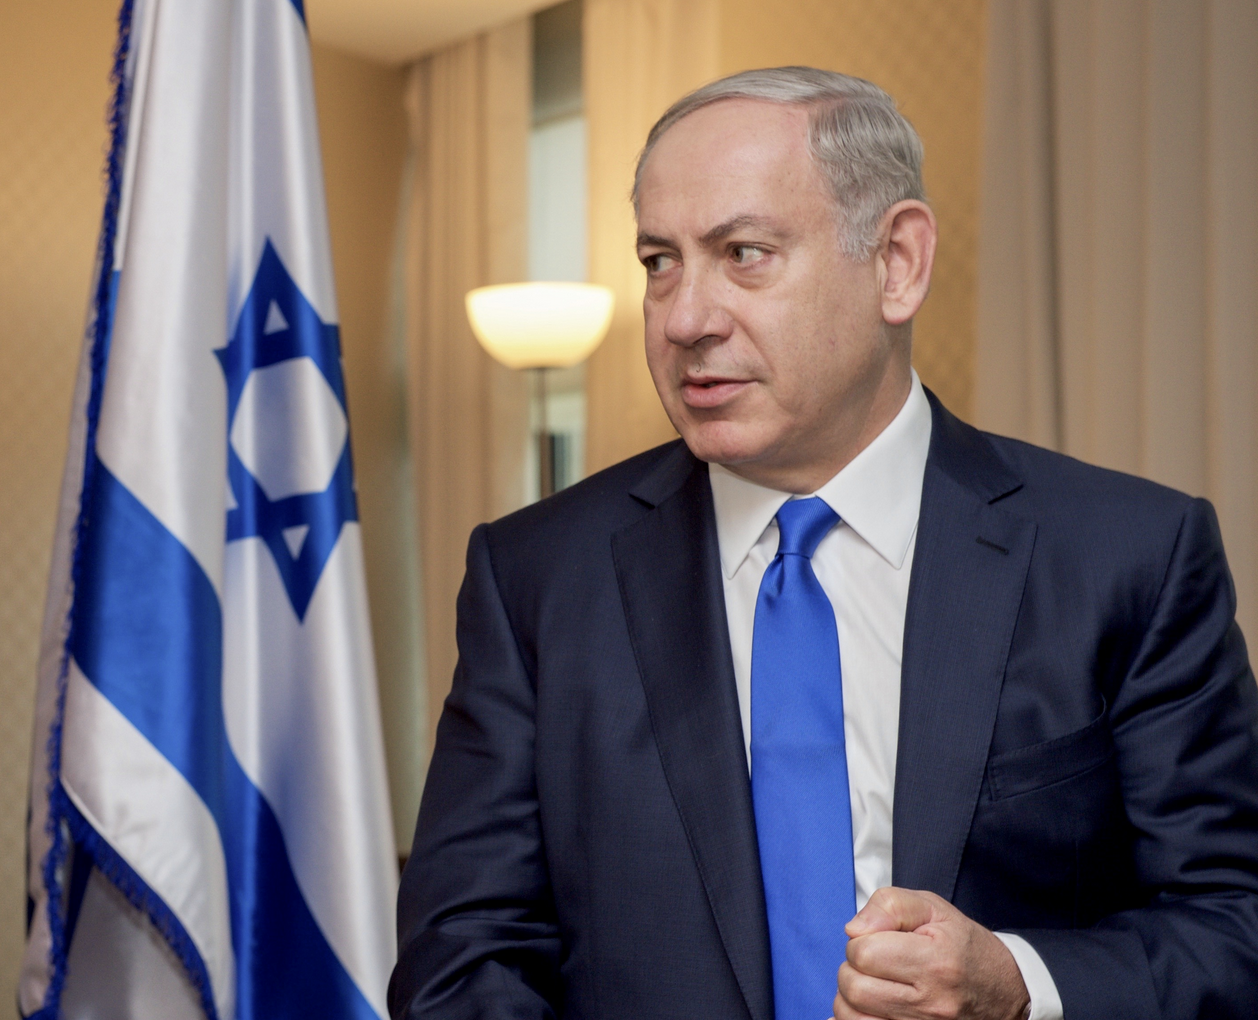 以色列總理尼坦雅胡 Netanyahu(圖/U.S. Department of State/public domain)